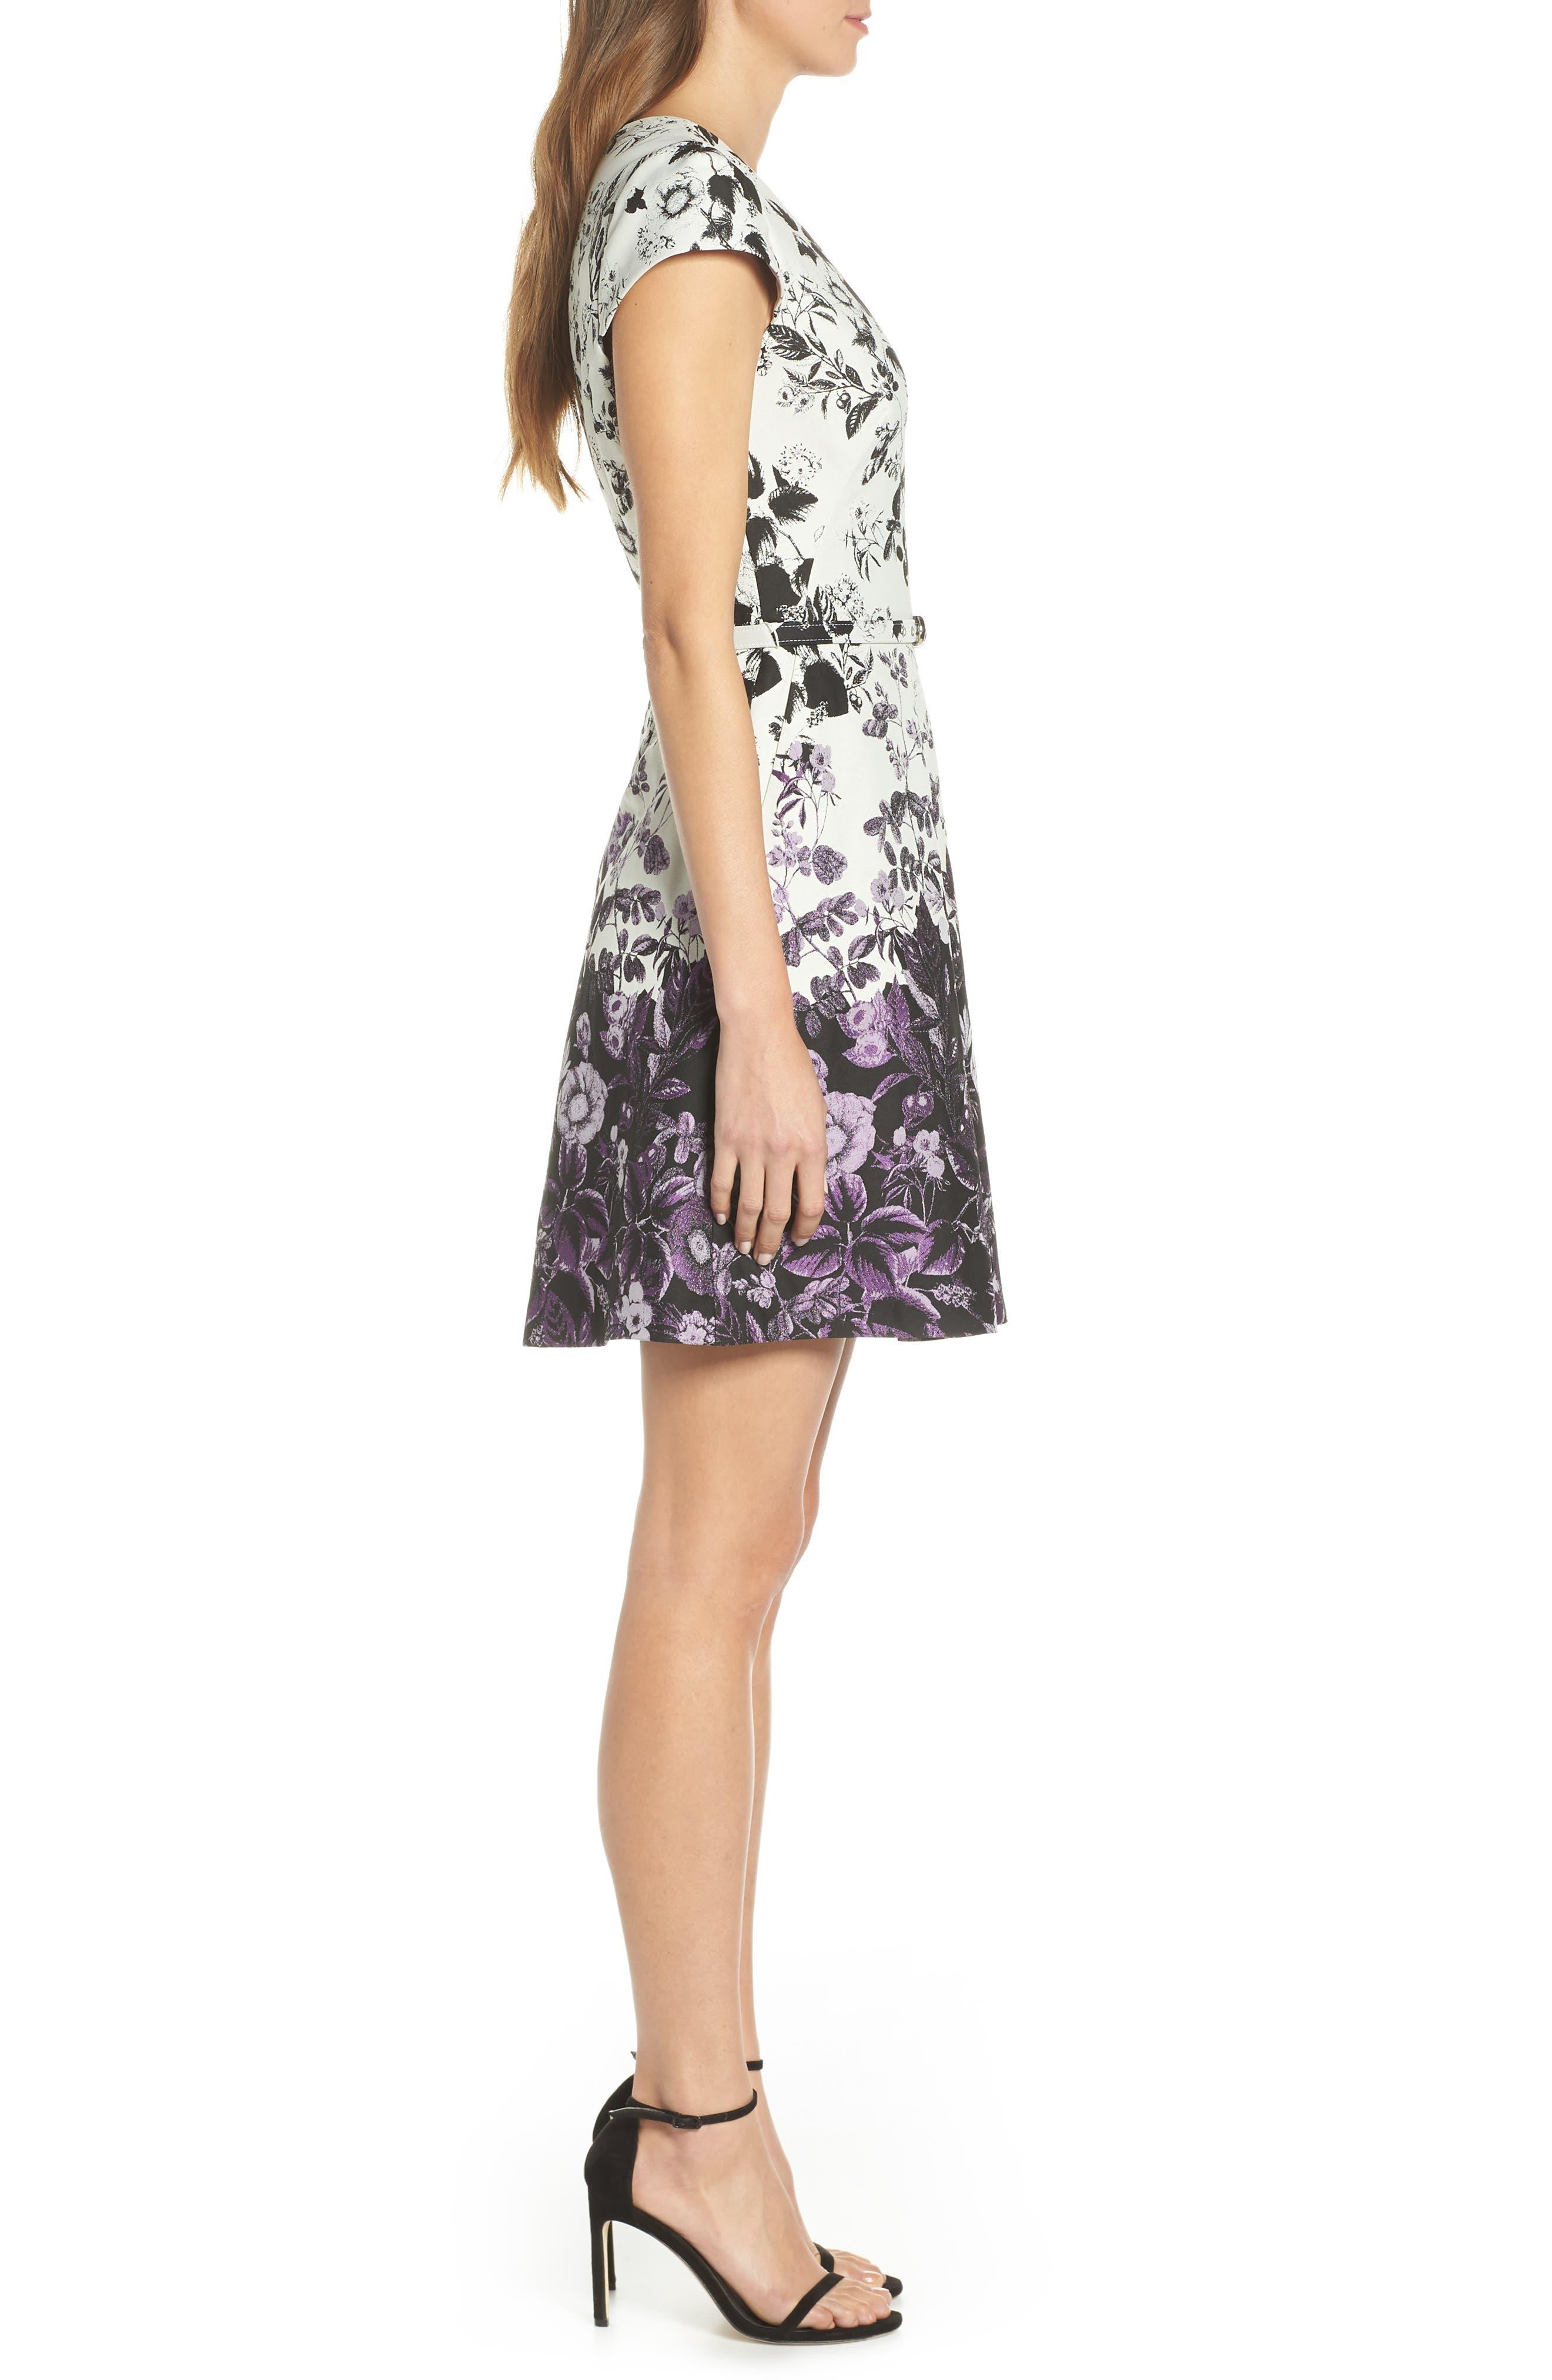 VINCE CAMUTO, Floral Jacquard Fit and Flare Dress, Alternate thumbnail 4, color, PURPLE MULTI